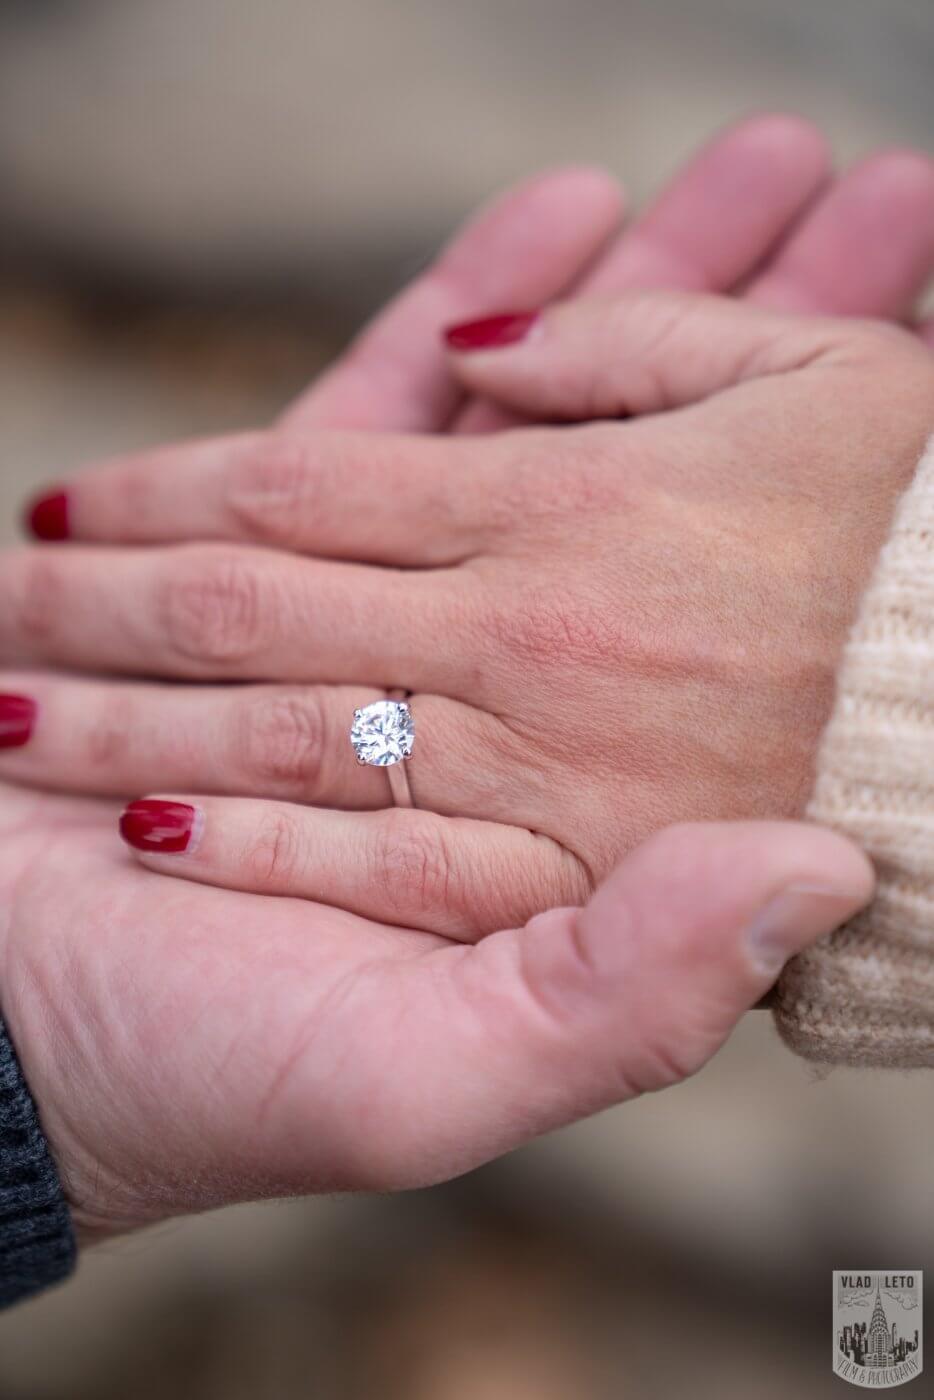 Photo 11 Central Park Wedding proposal | VladLeto